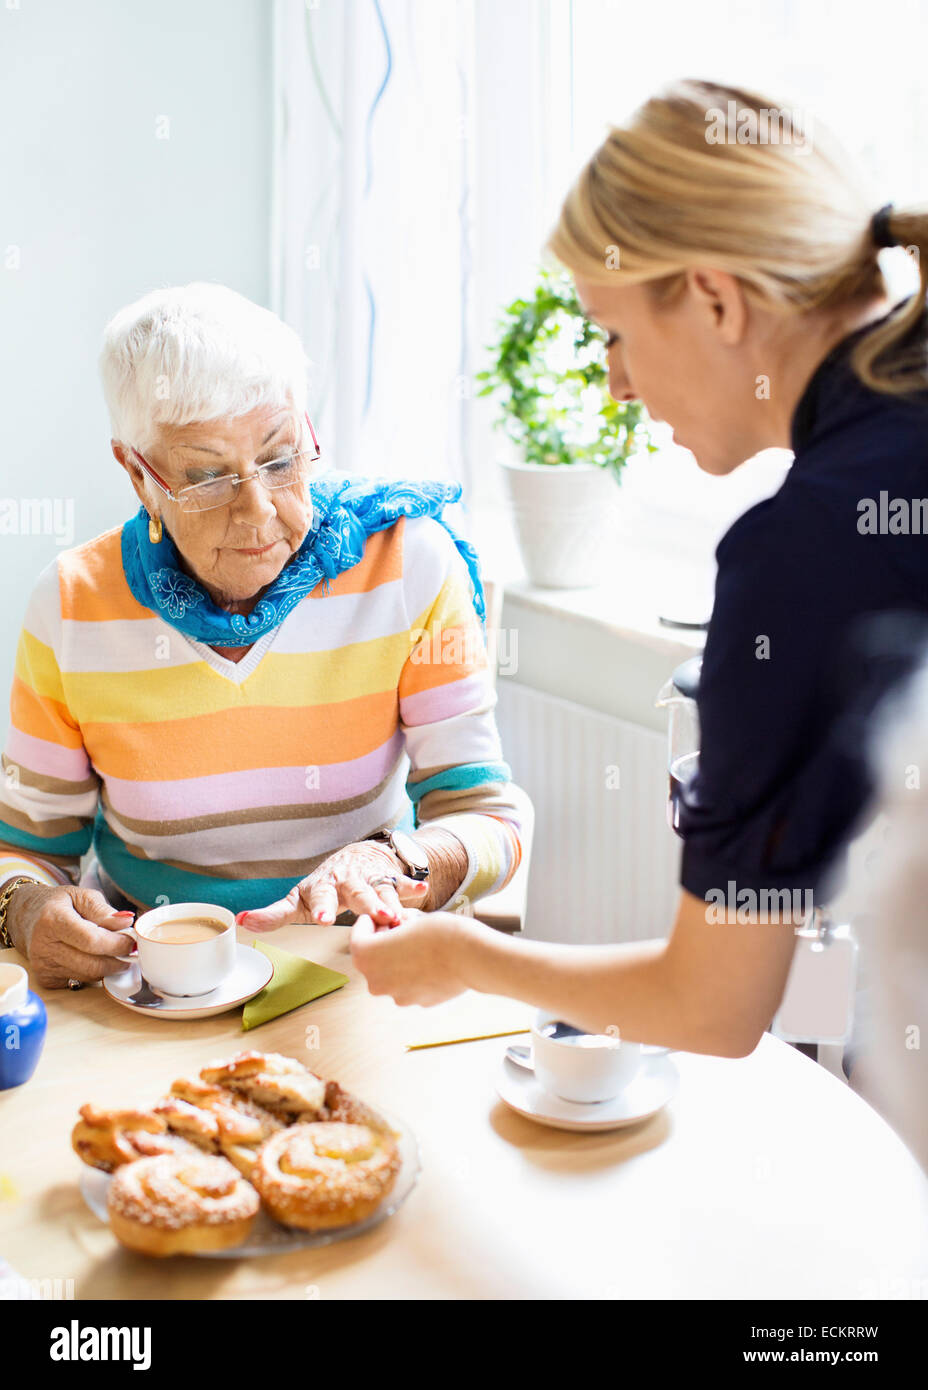 Female caretaker examining senior woman's finger at breakfast table in nursing home - Stock Image